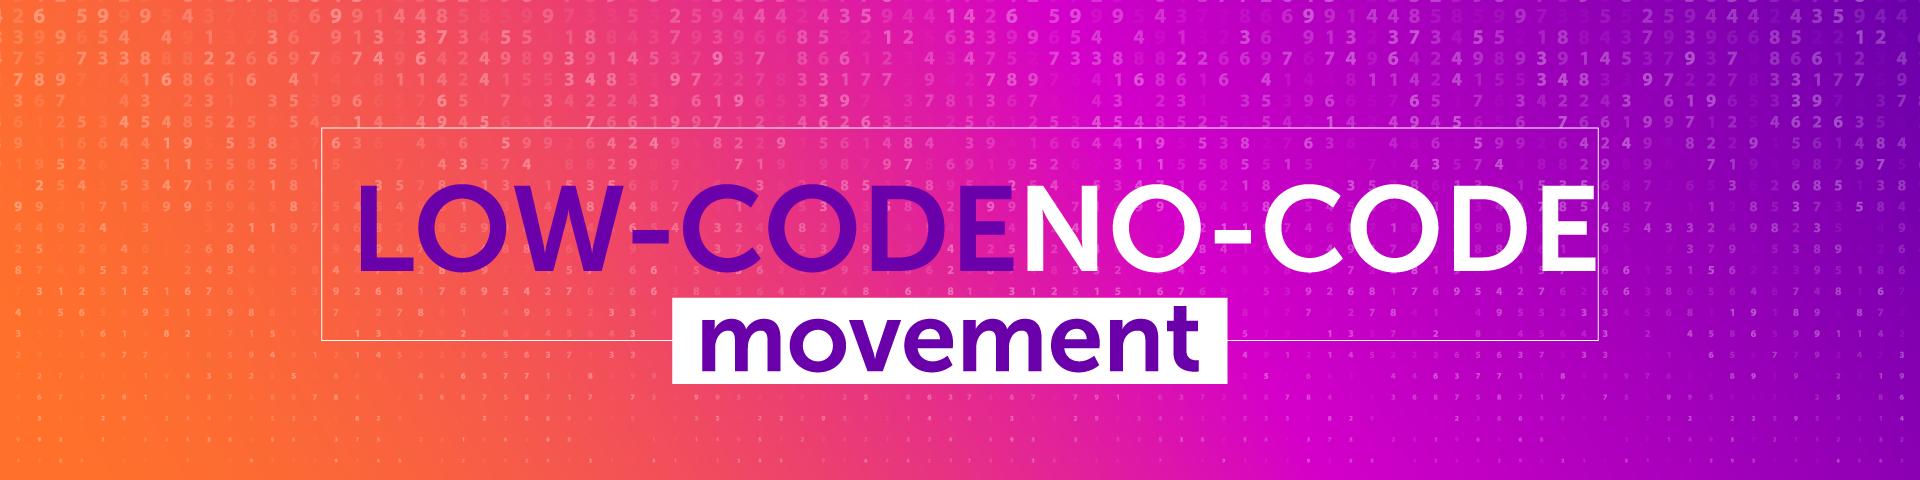 Low-Code / No-Code Movement